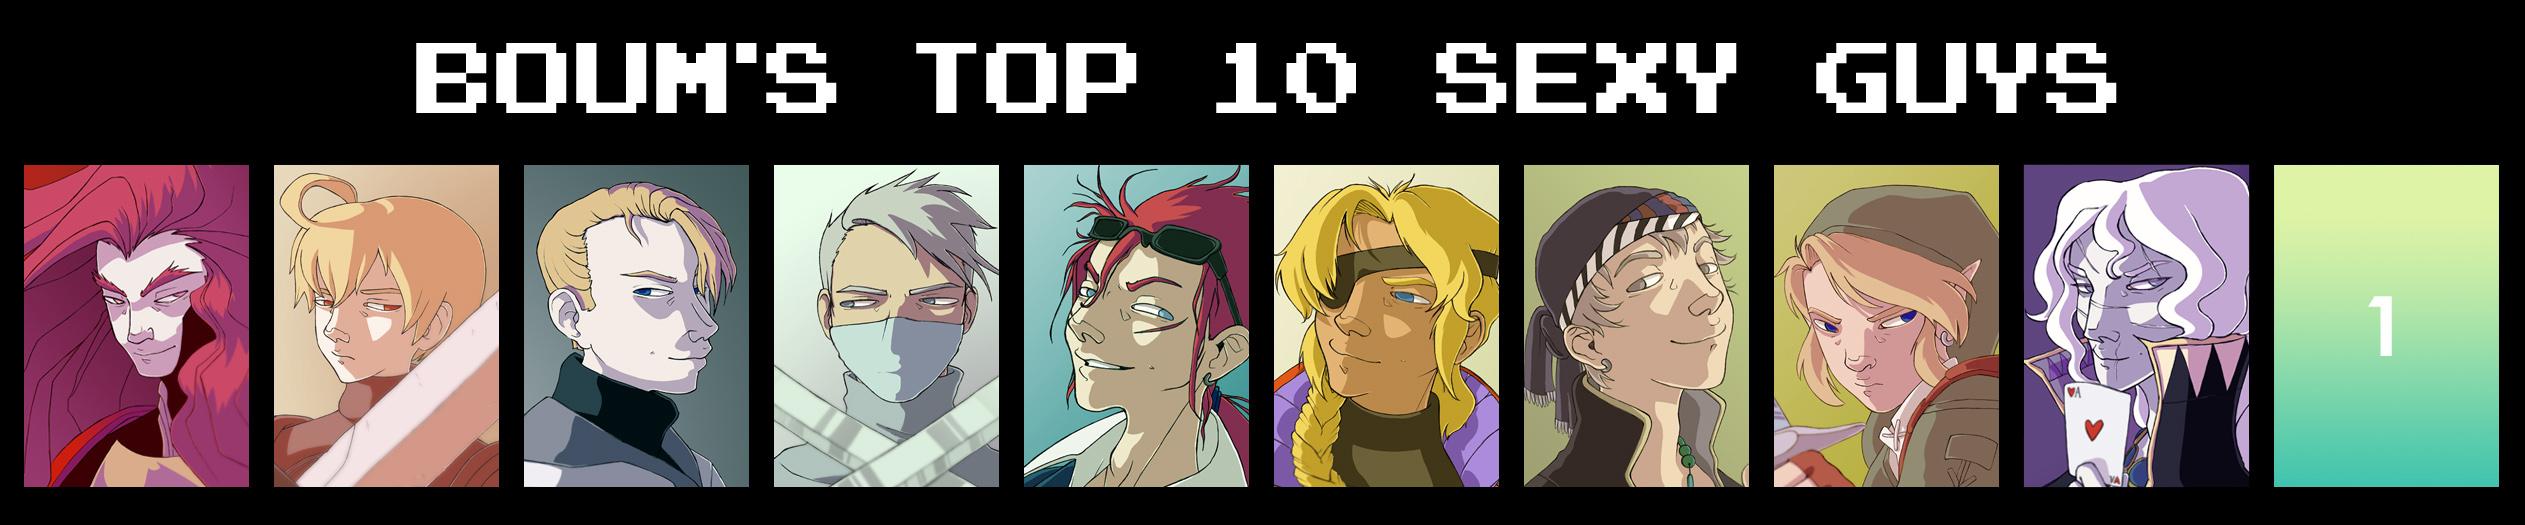 BOUM'S TOP 10 SEXY GUYS